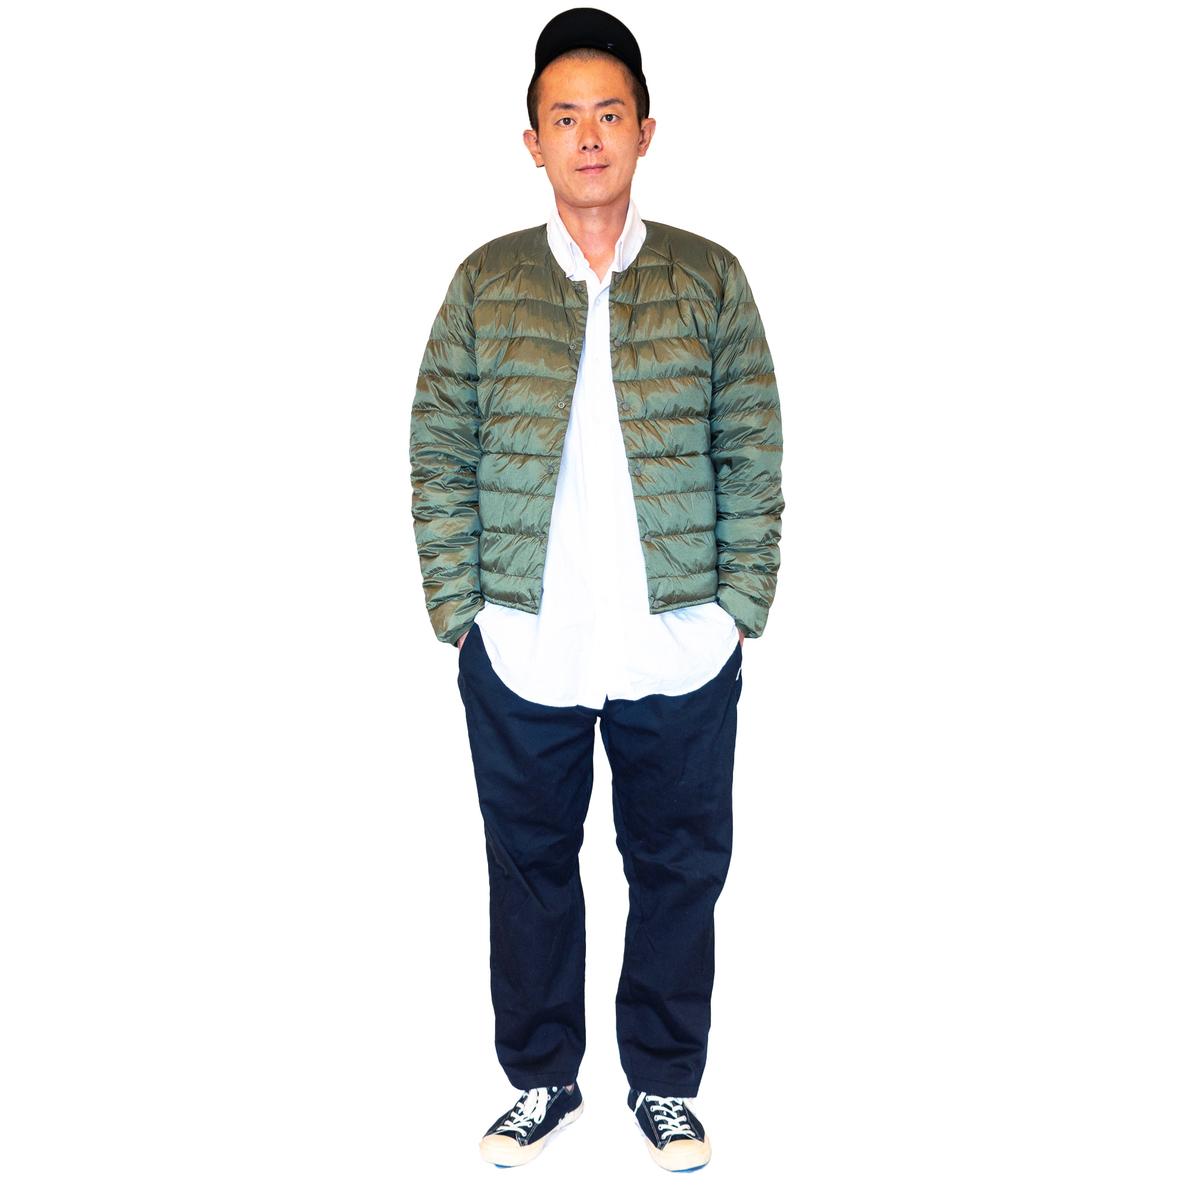 f:id:yamada0221:20210816112721j:plain